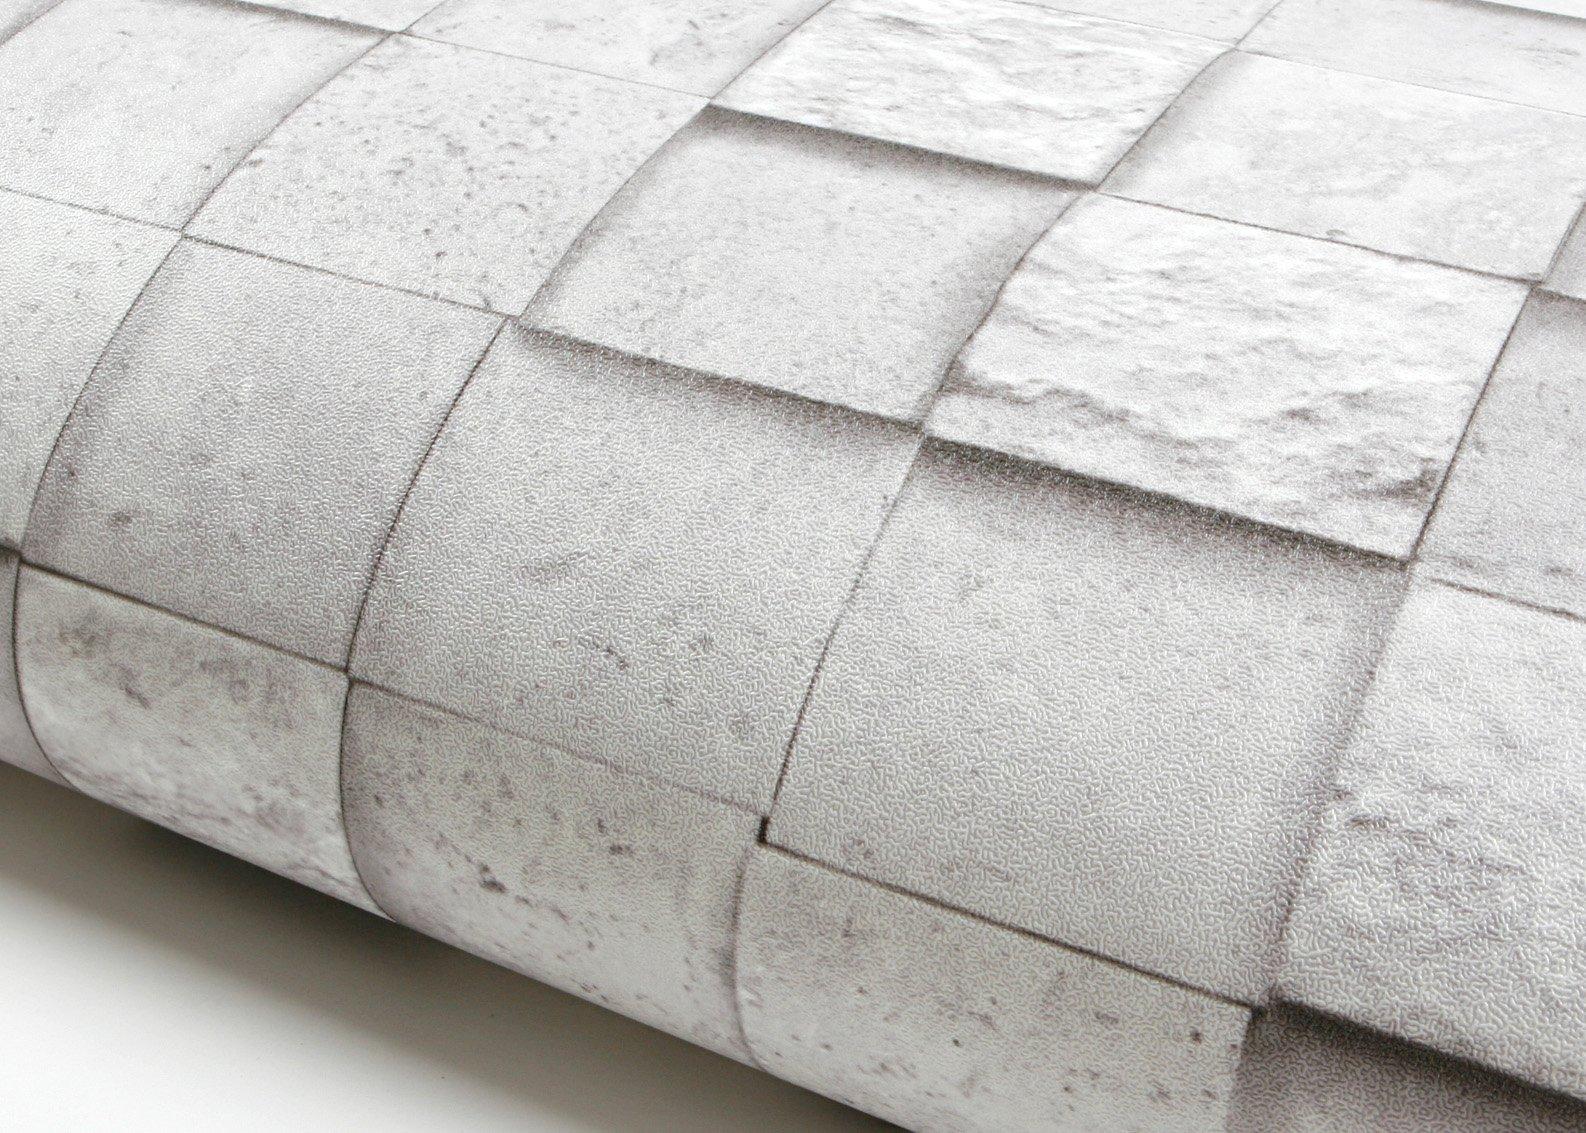 ROSEROSA Peel & Stick Backsplash Graphic Tile Textured Self-Adhesive Vinyl Contact paper Interior Film Shelf Liner Table and Door Reform (LW742 : 2.00 Feet X 6.56 Feet)